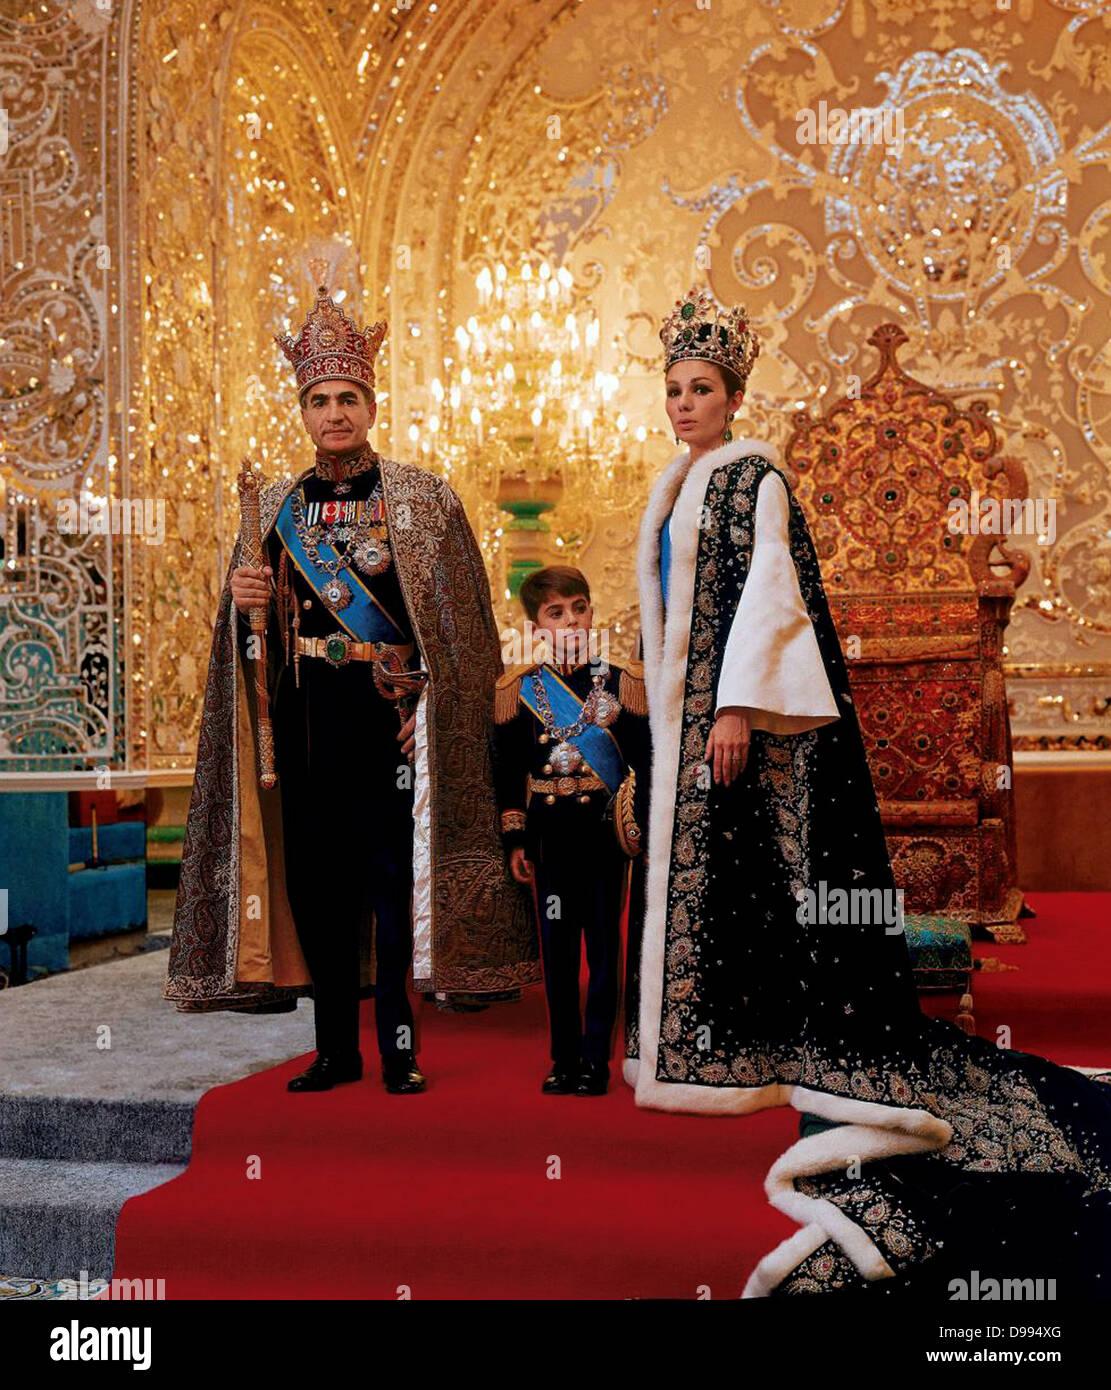 Mohammed Reza Shah Pahlavi (1919-1980) Shah of Iran 1941-1979, with his third wife Farah Diba and their son Reza - Stock Image